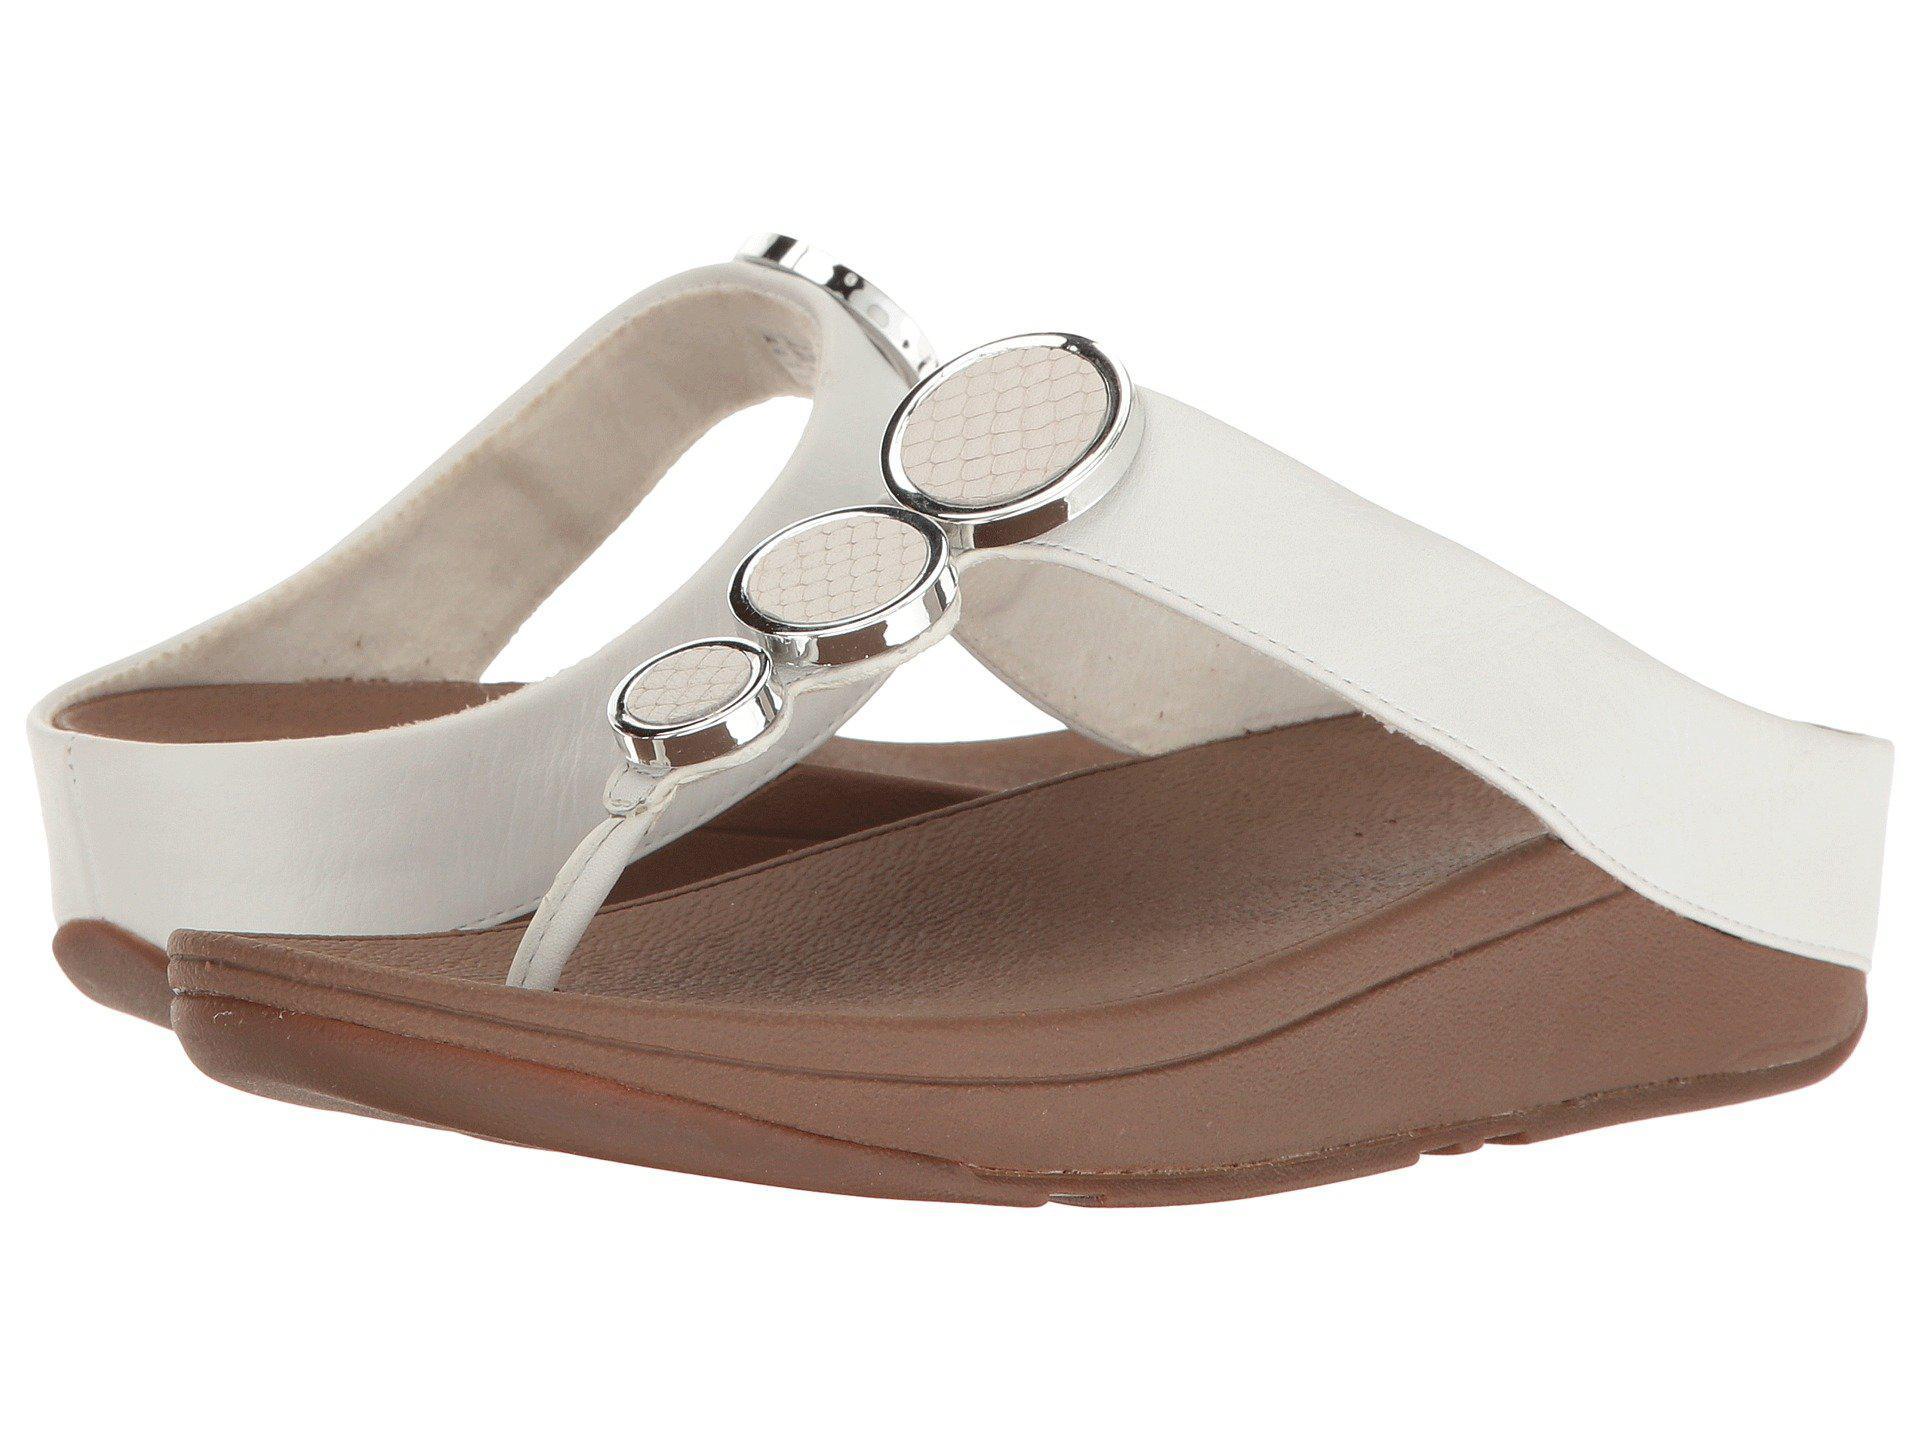 a0d811f8ea2e Lyst - Fitflop Halo Toe Thong Sandals